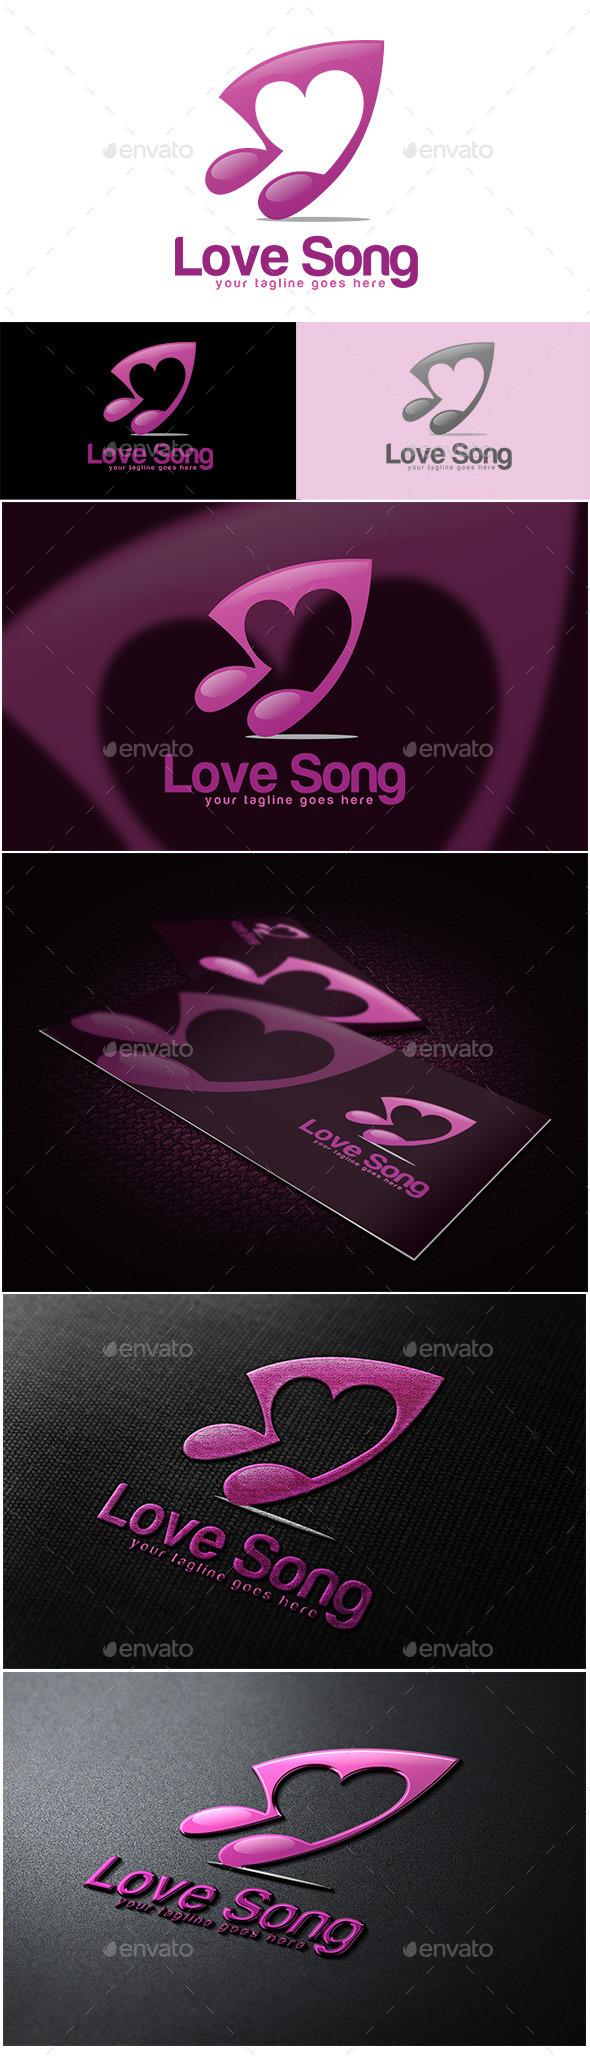 Love Song Logo - Symbols Logo Templates